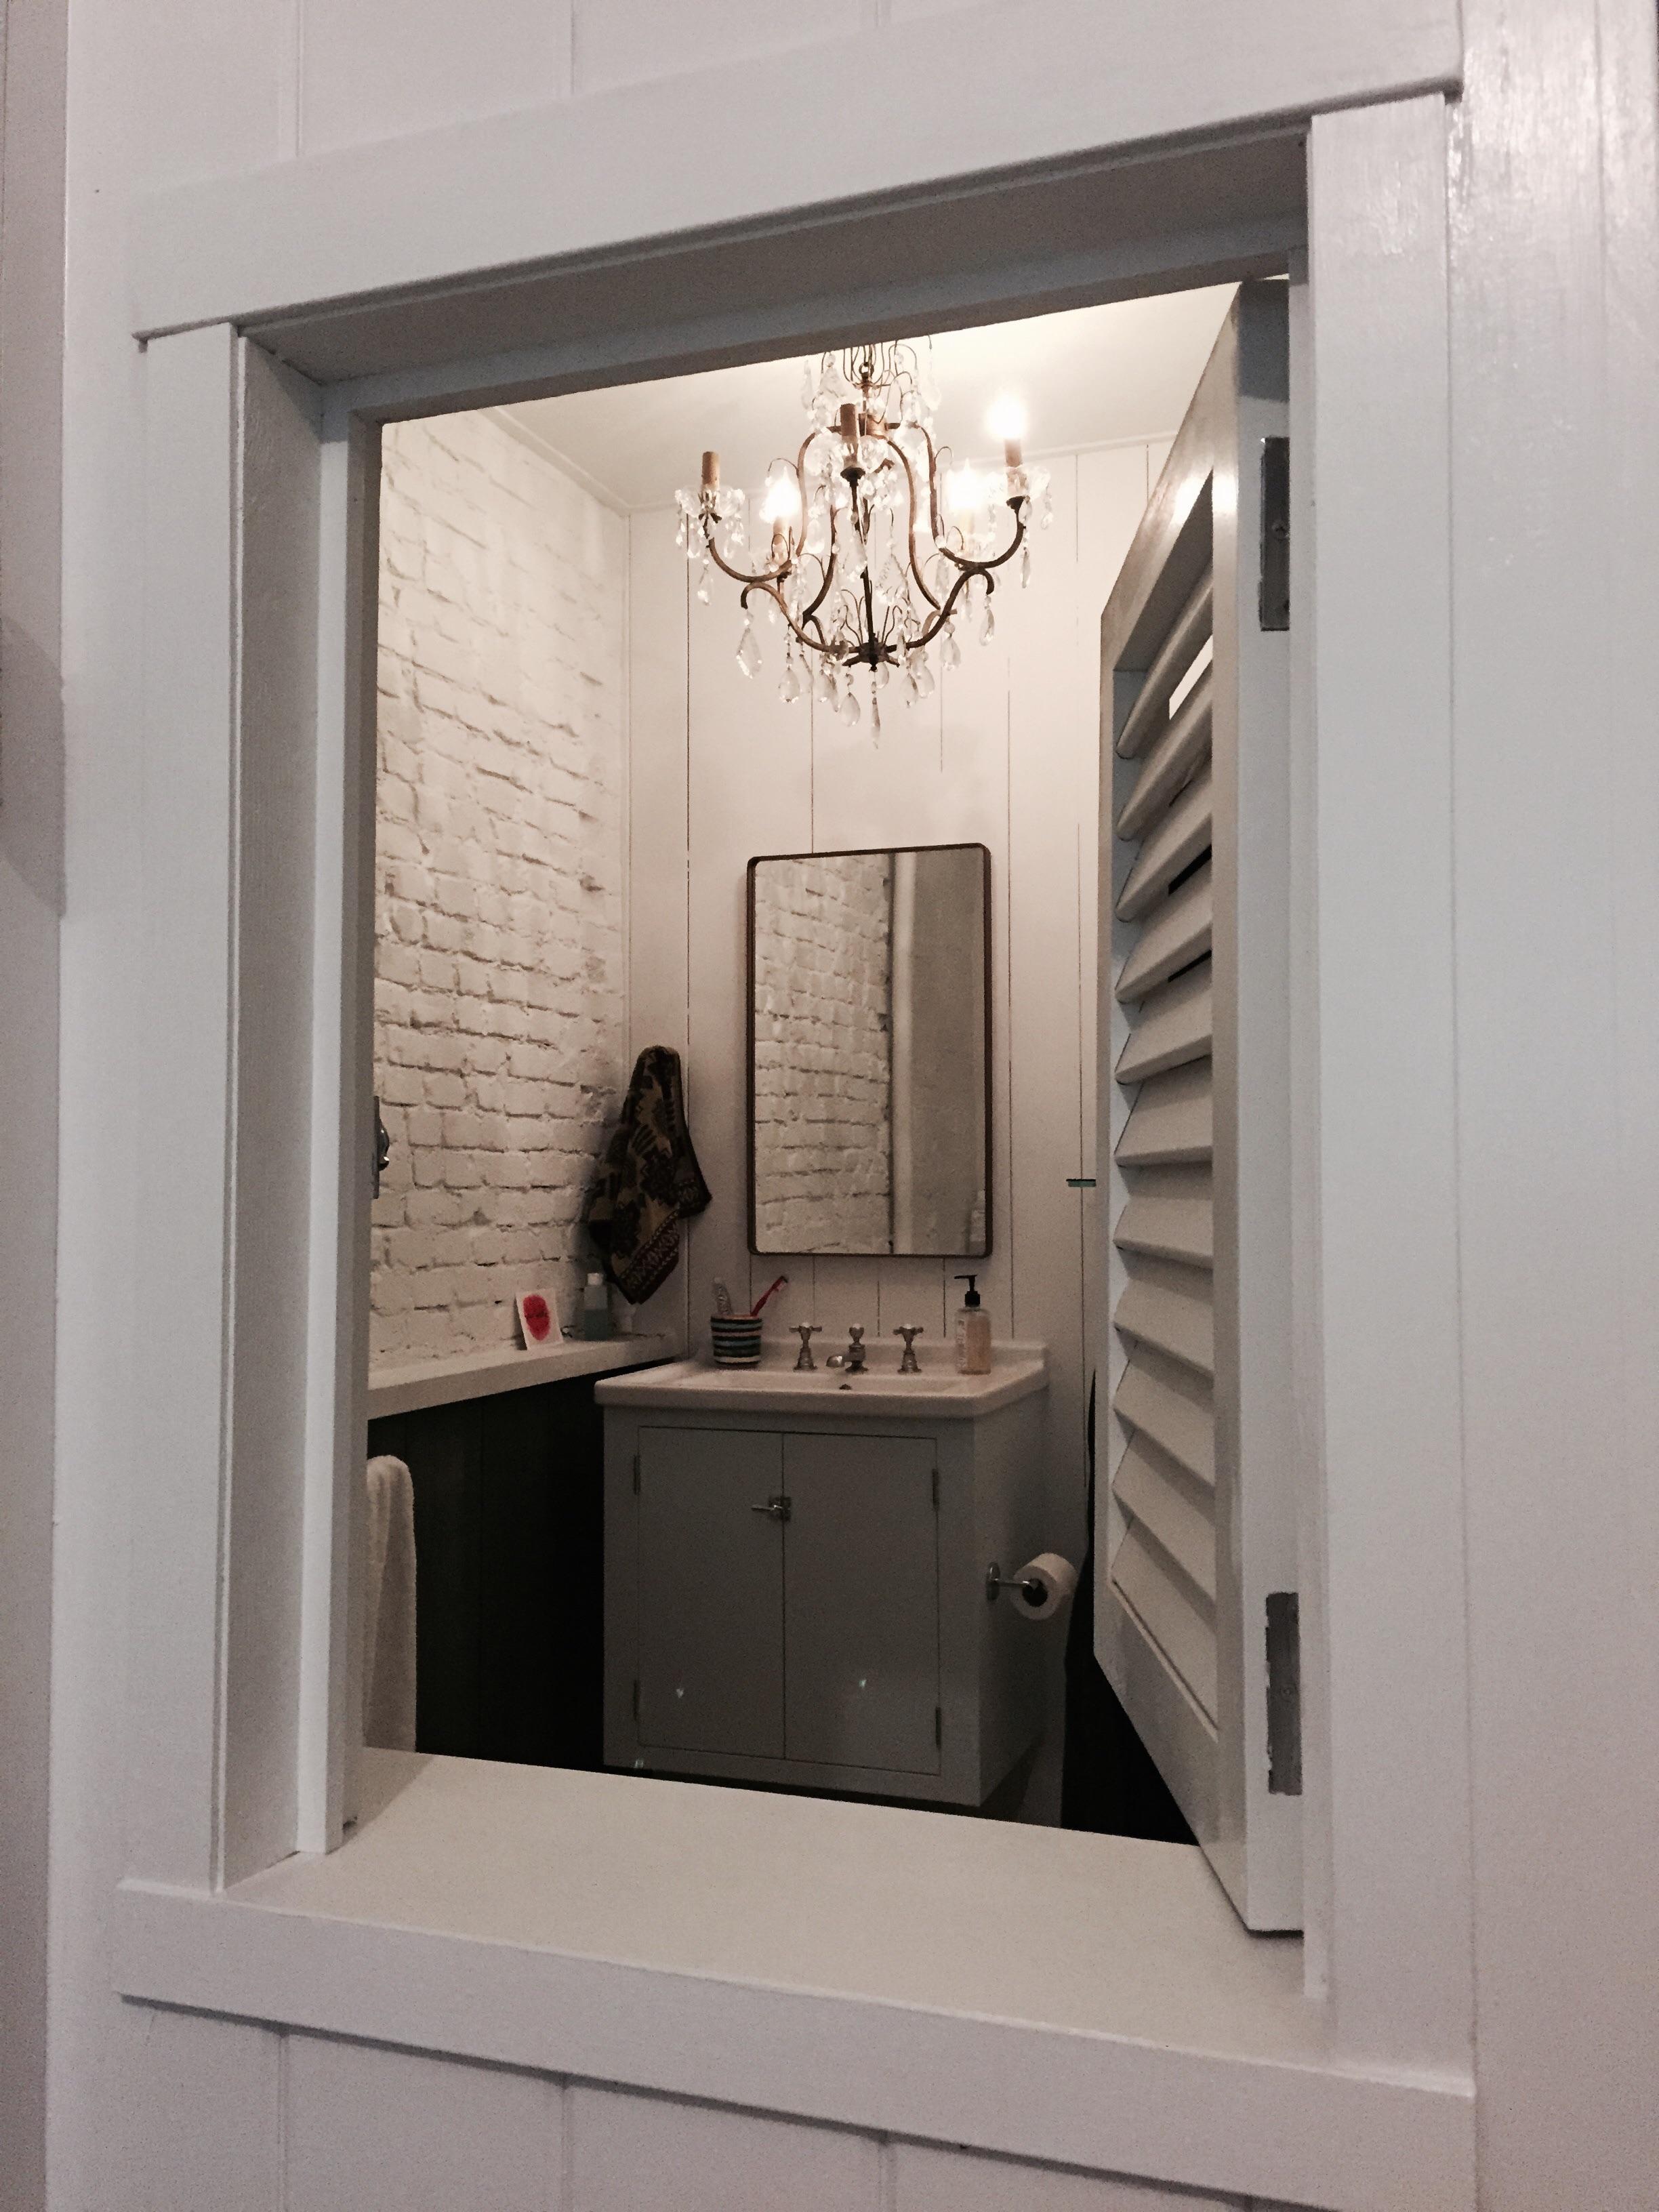 Window into Bathroom